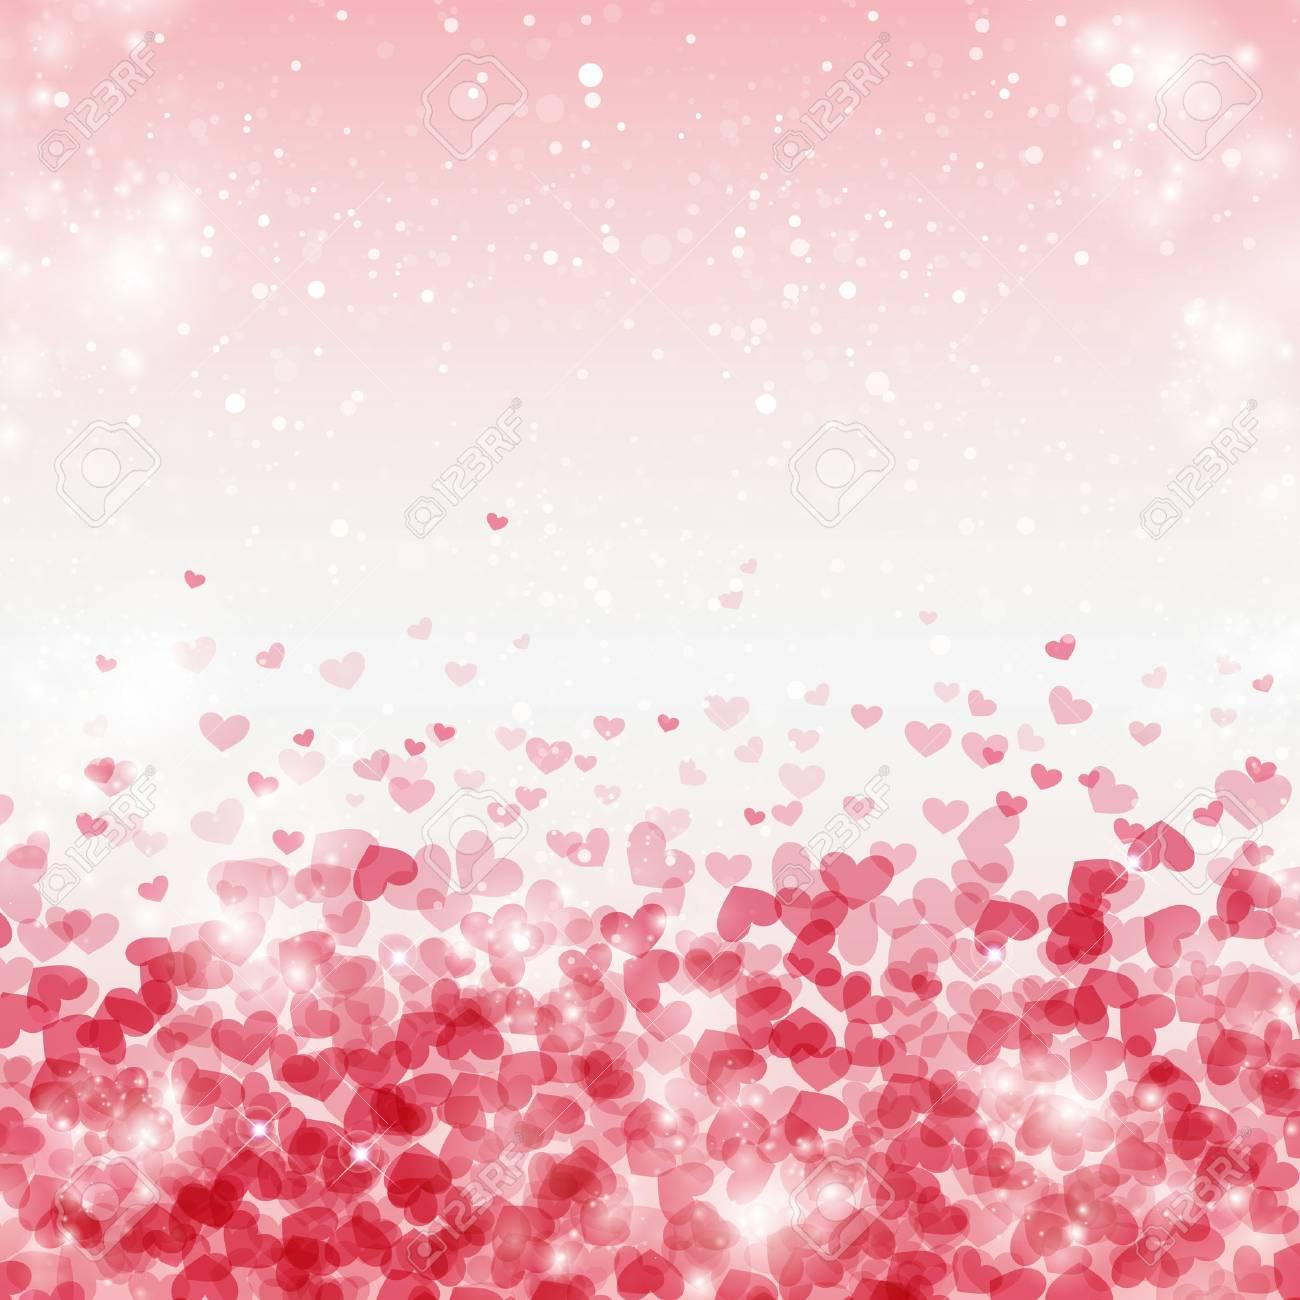 heart background - 50868293